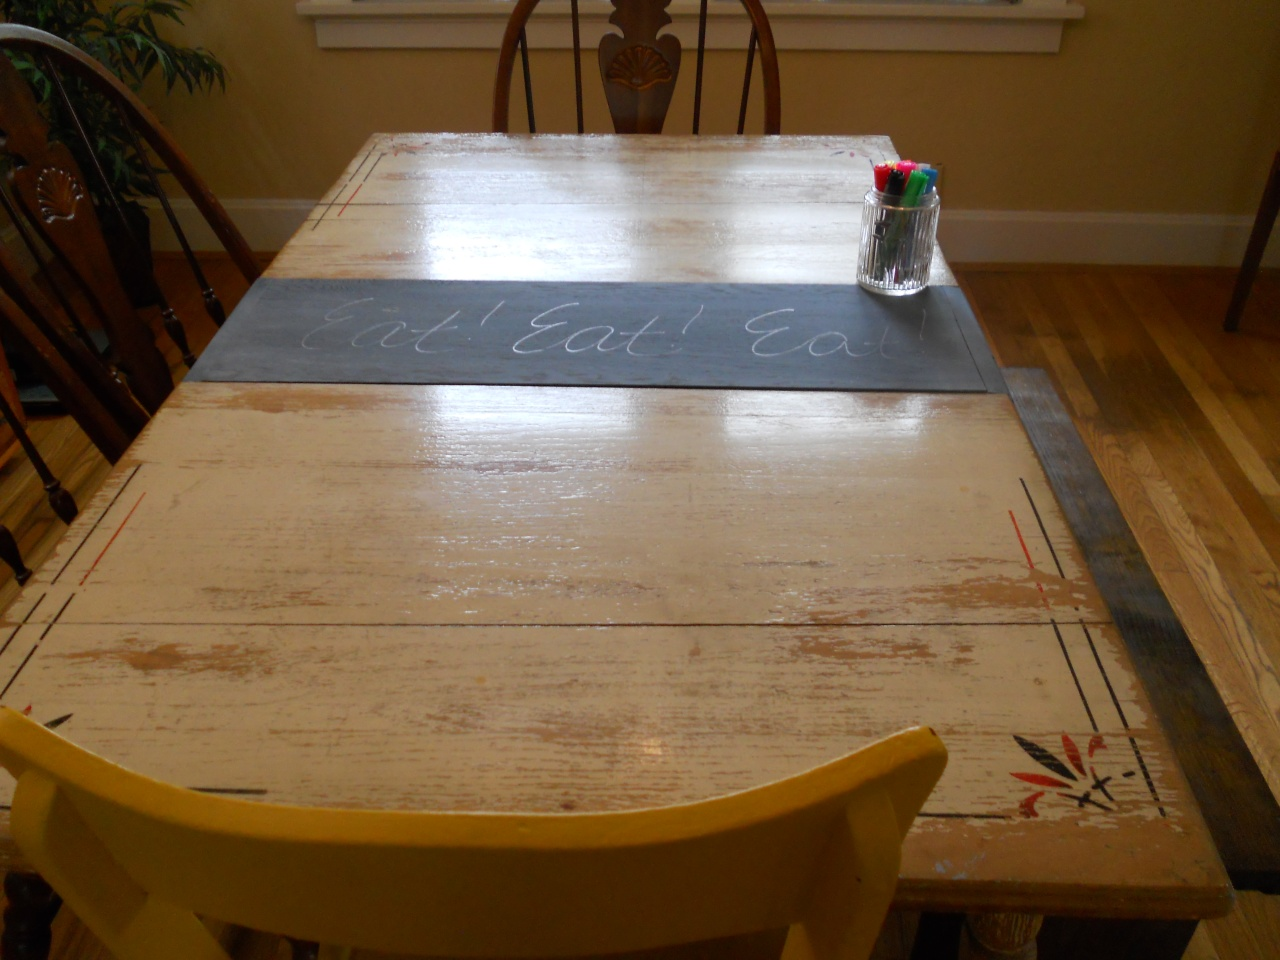 chalkdboard table